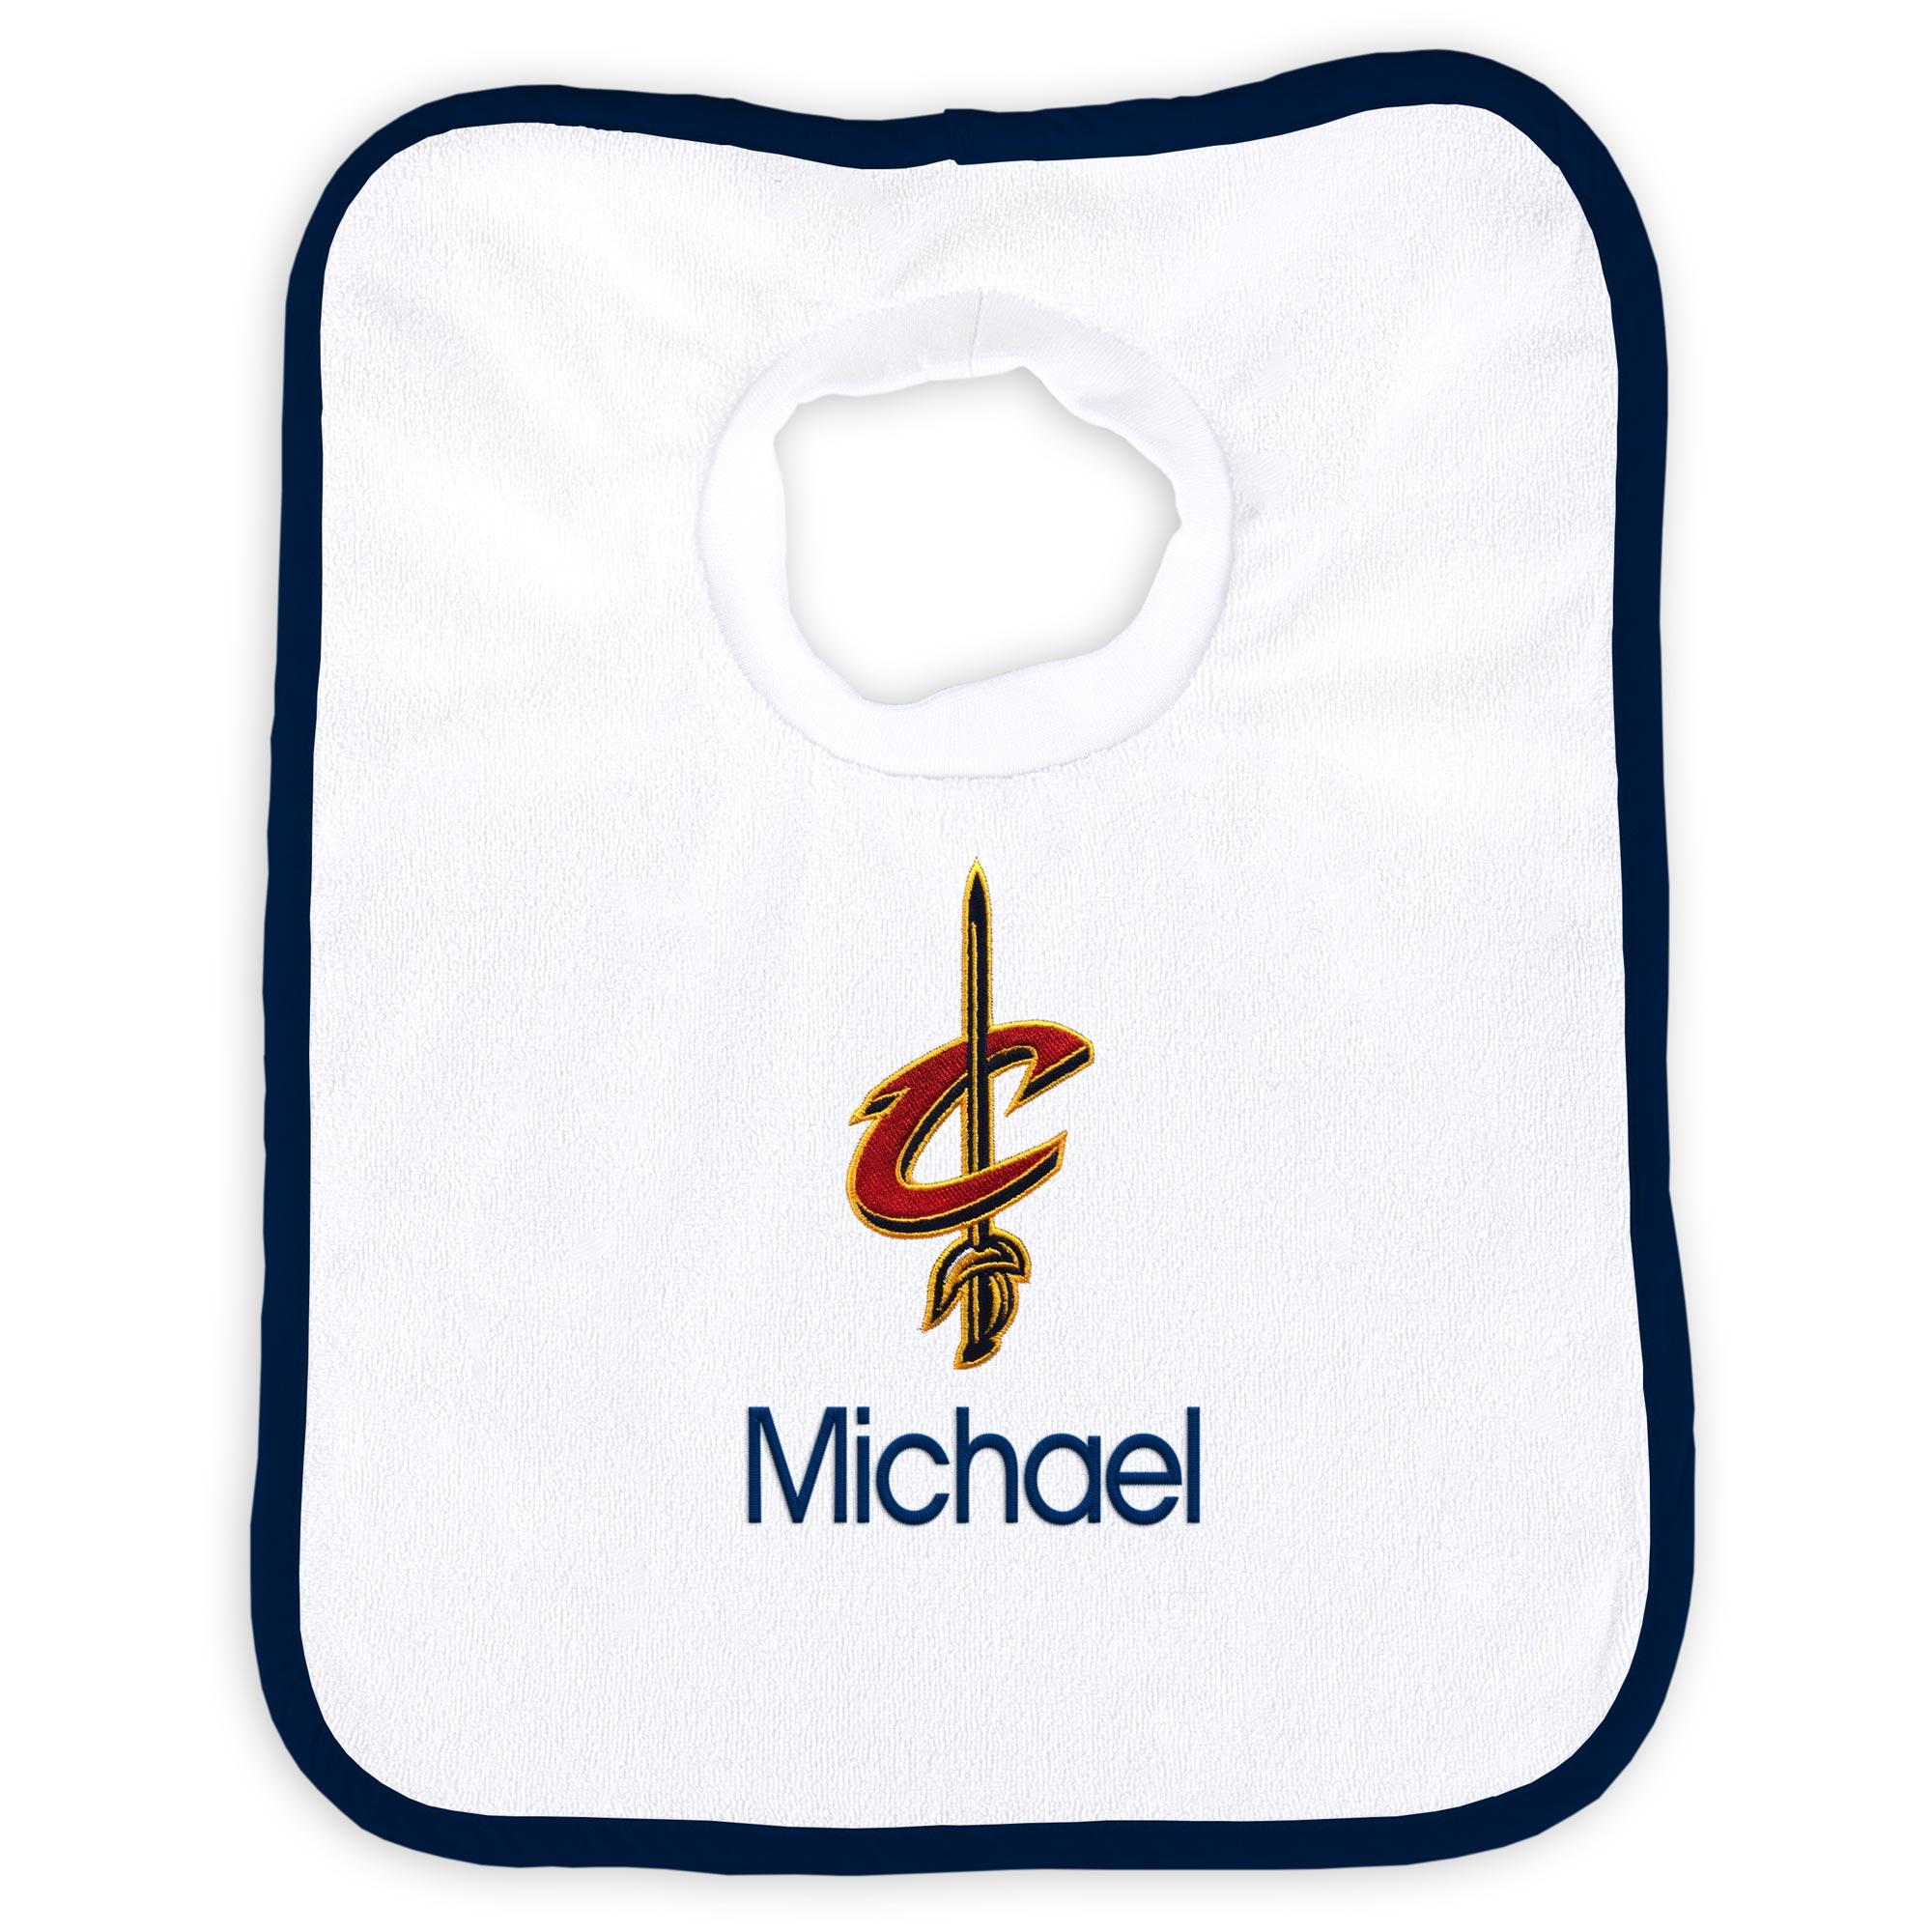 Cleveland Cavaliers Newborn & Infant Personalized Bib - White